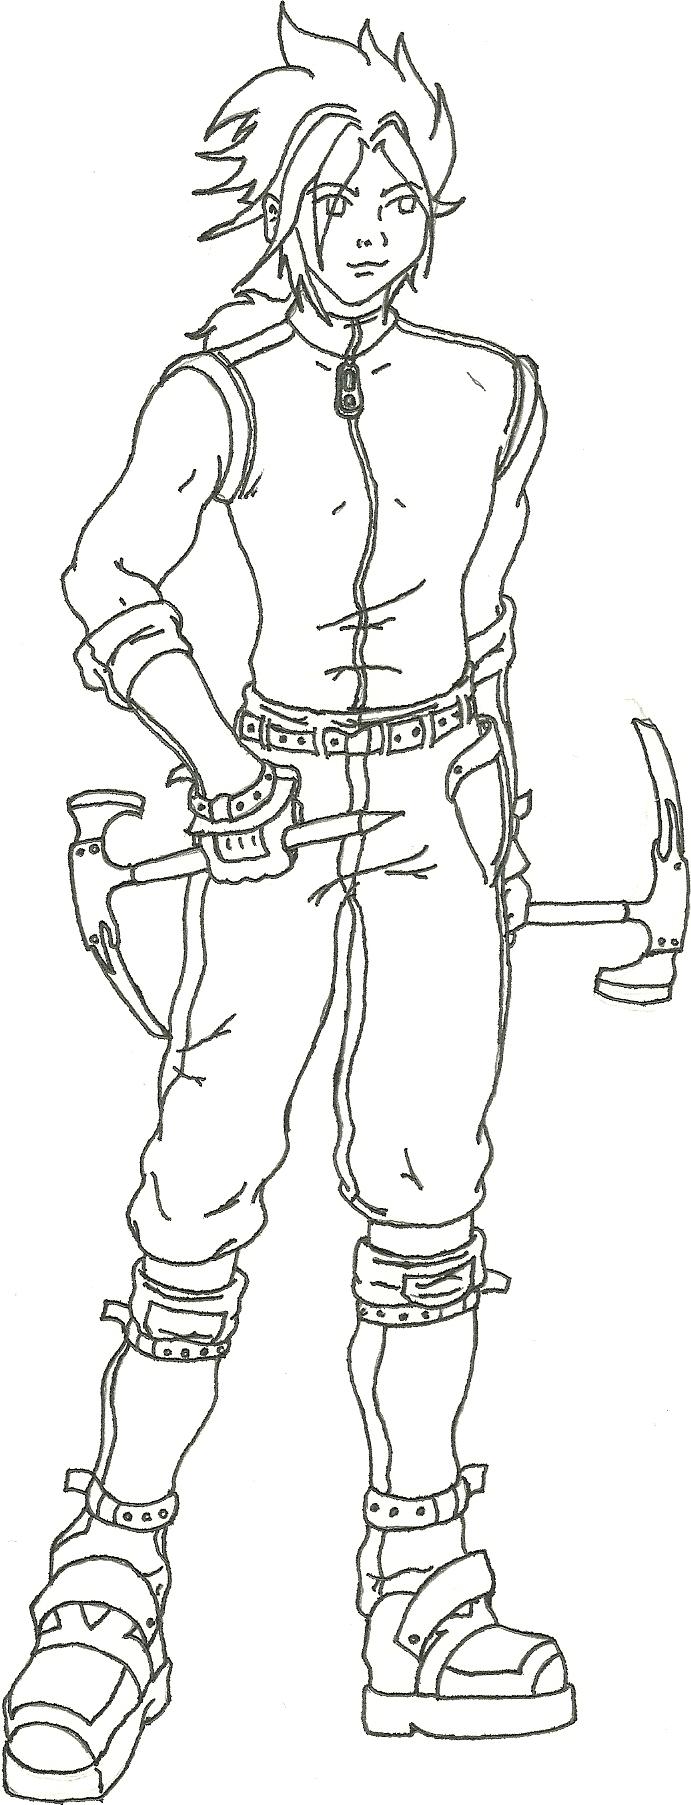 Character design - Christophe